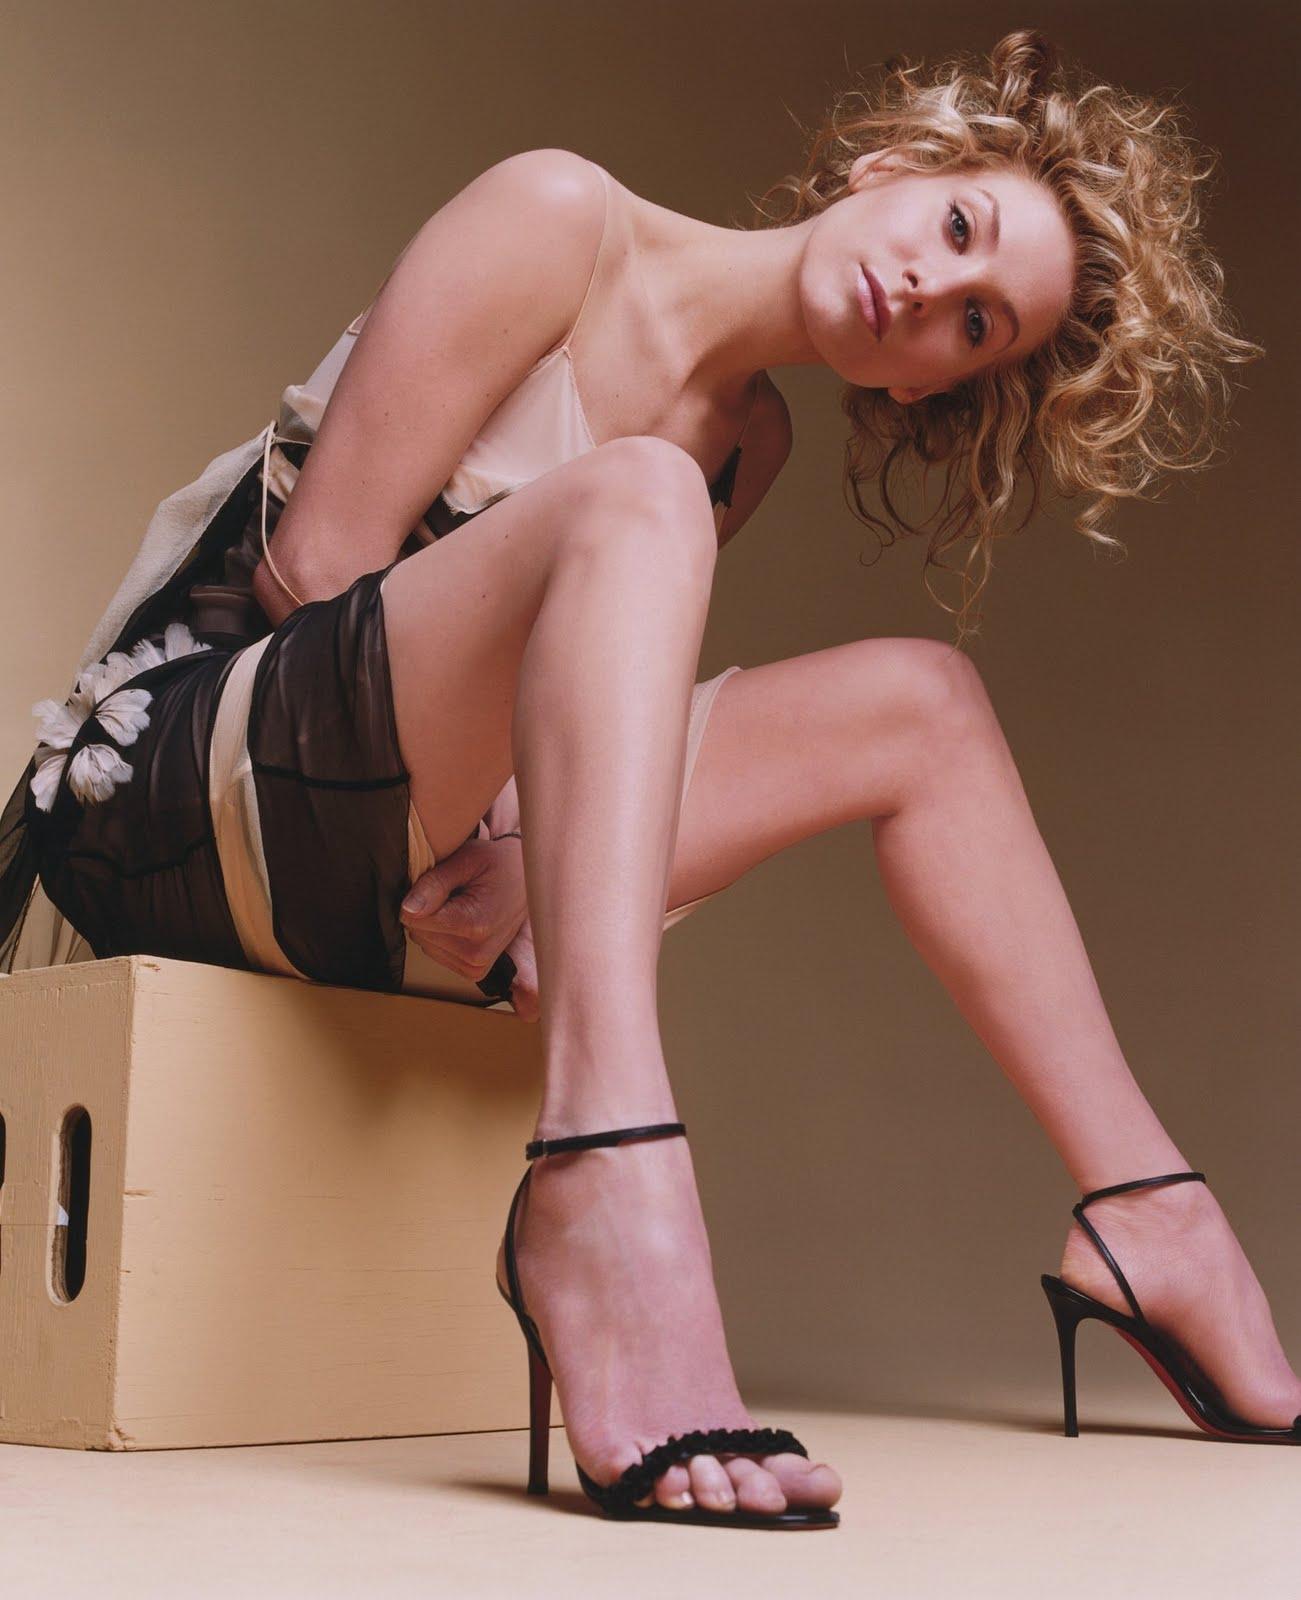 Elizabeth mitchell sexy feet pics